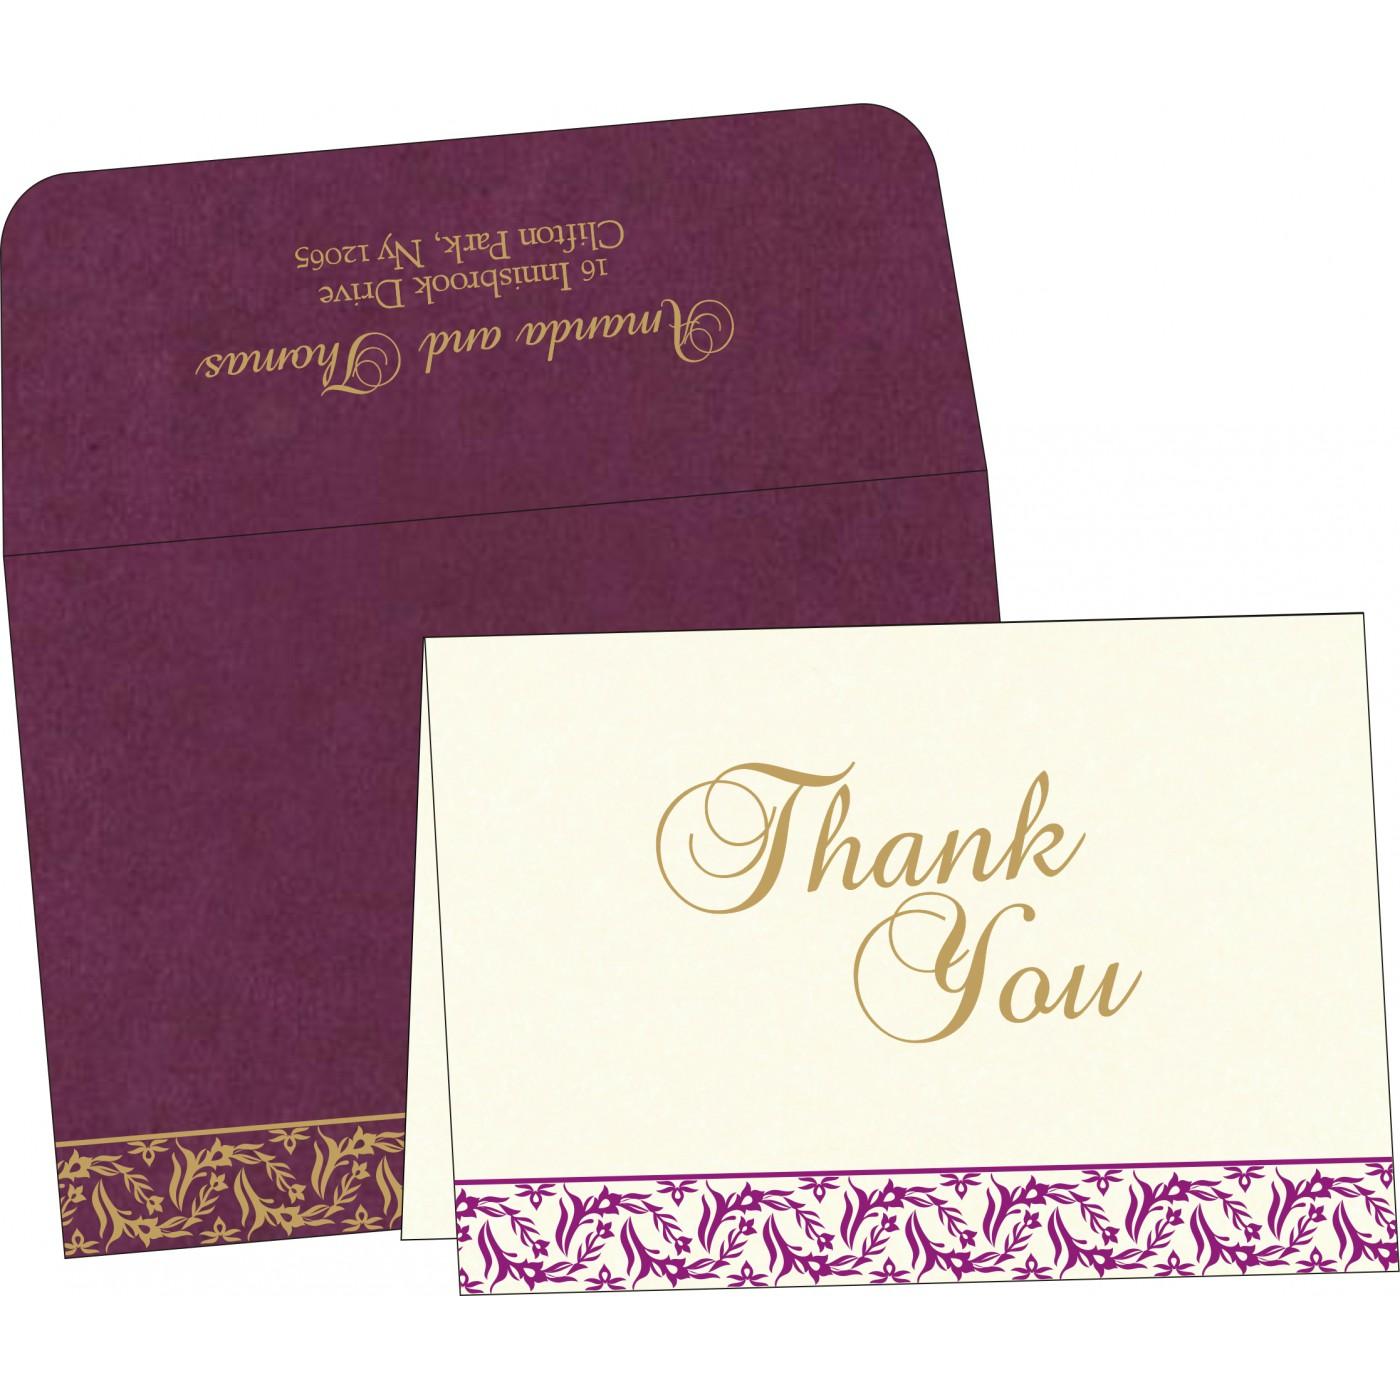 Thank You Cards : TYC-8249I - 123WeddingCards